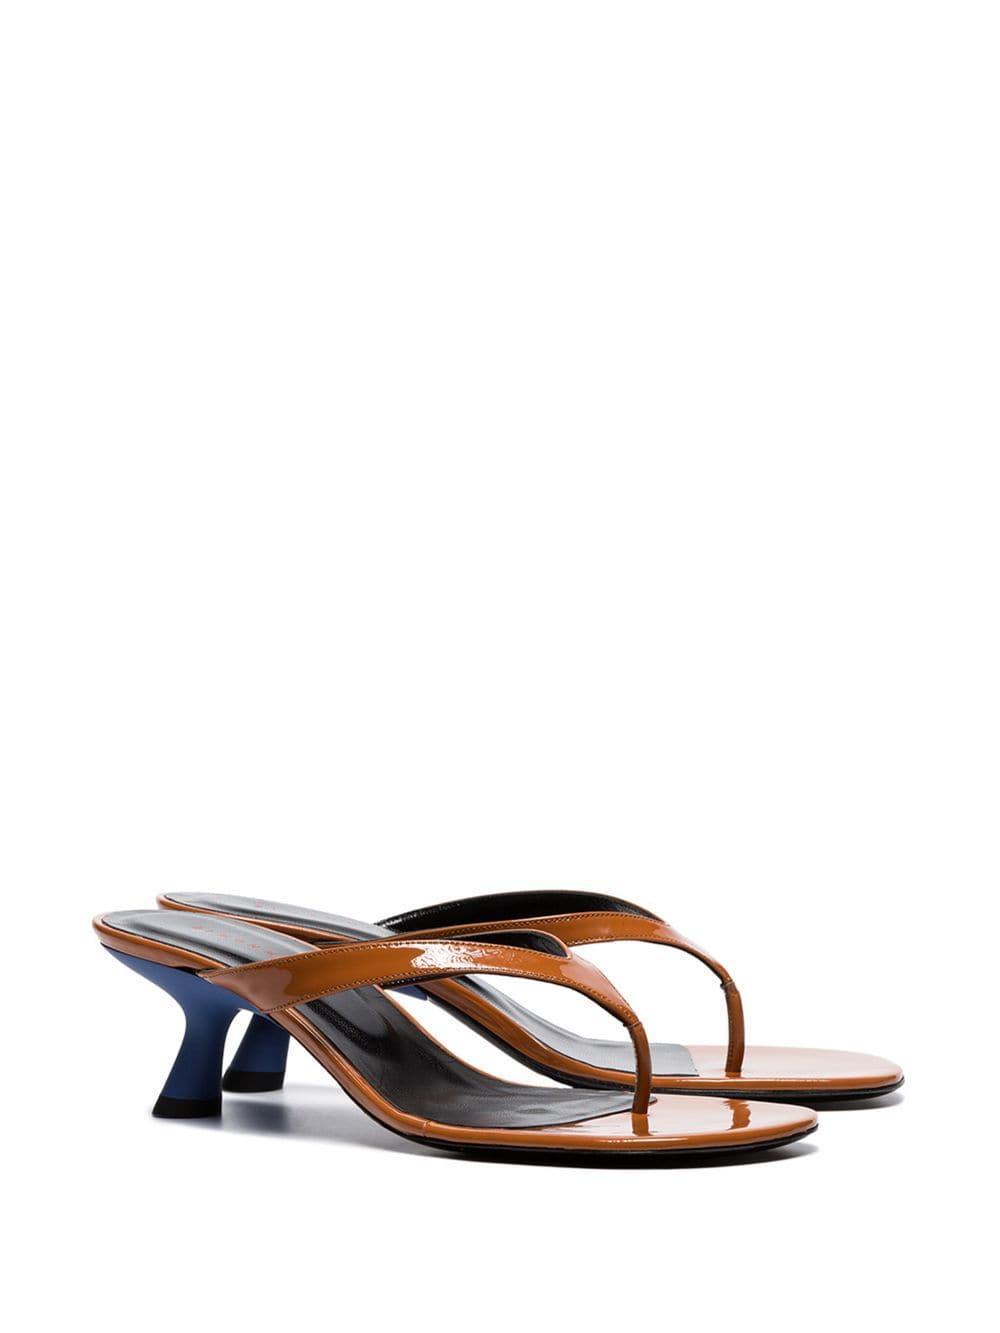 669a5d2da Simon Miller - Brown Beep 45 Patent Leather Thong Sandals - Lyst. View  fullscreen